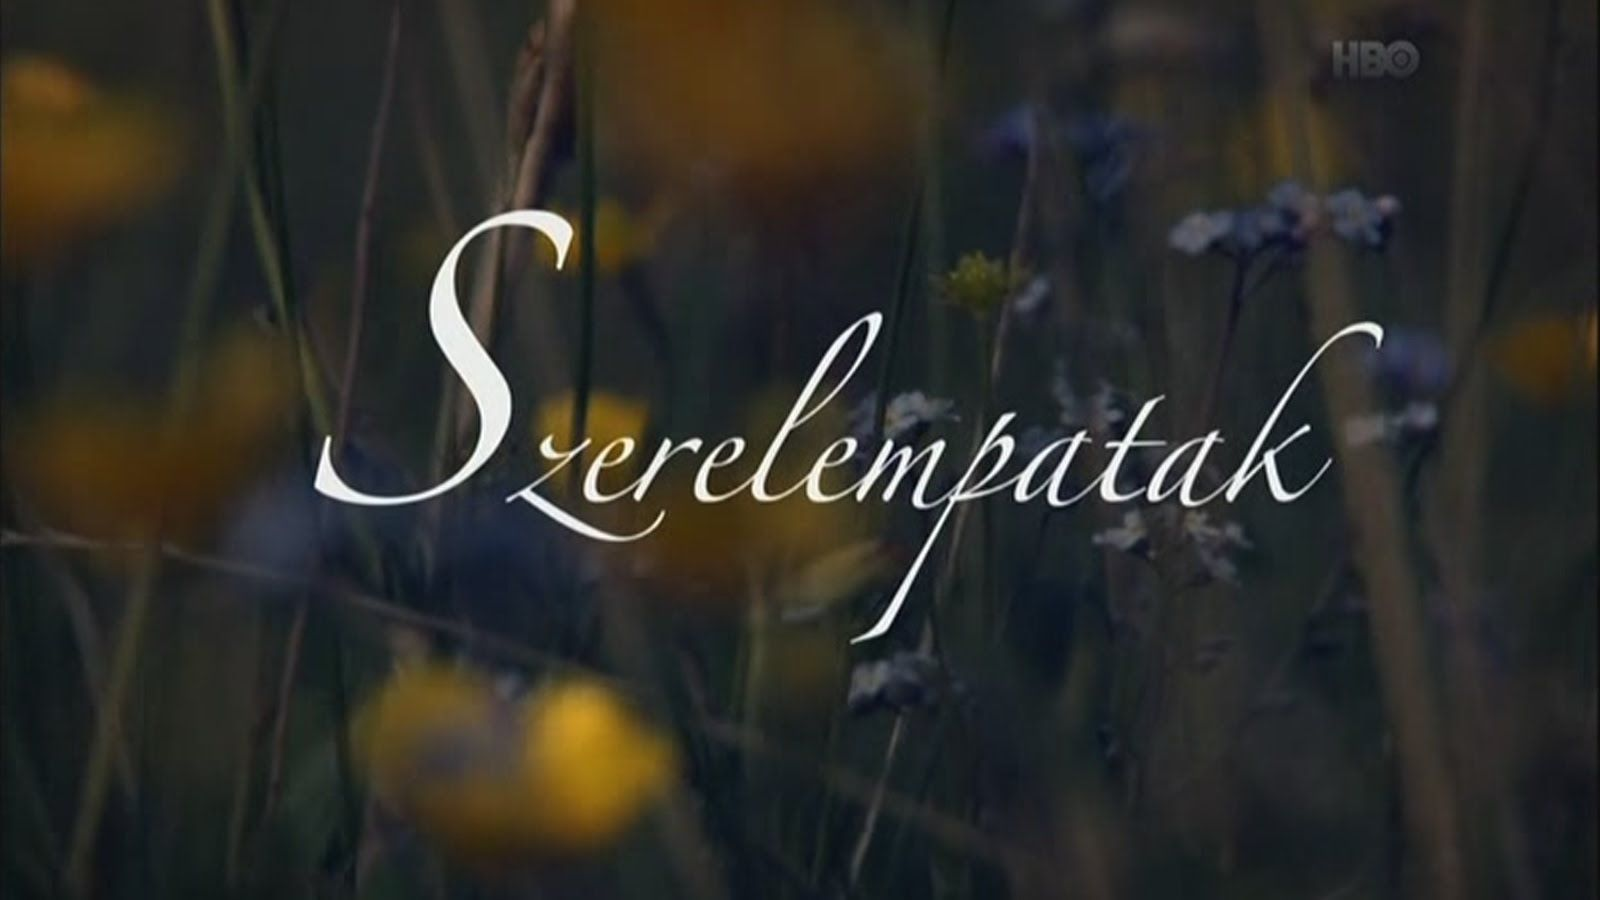 Szerelempatak Documentaries Film Hbo